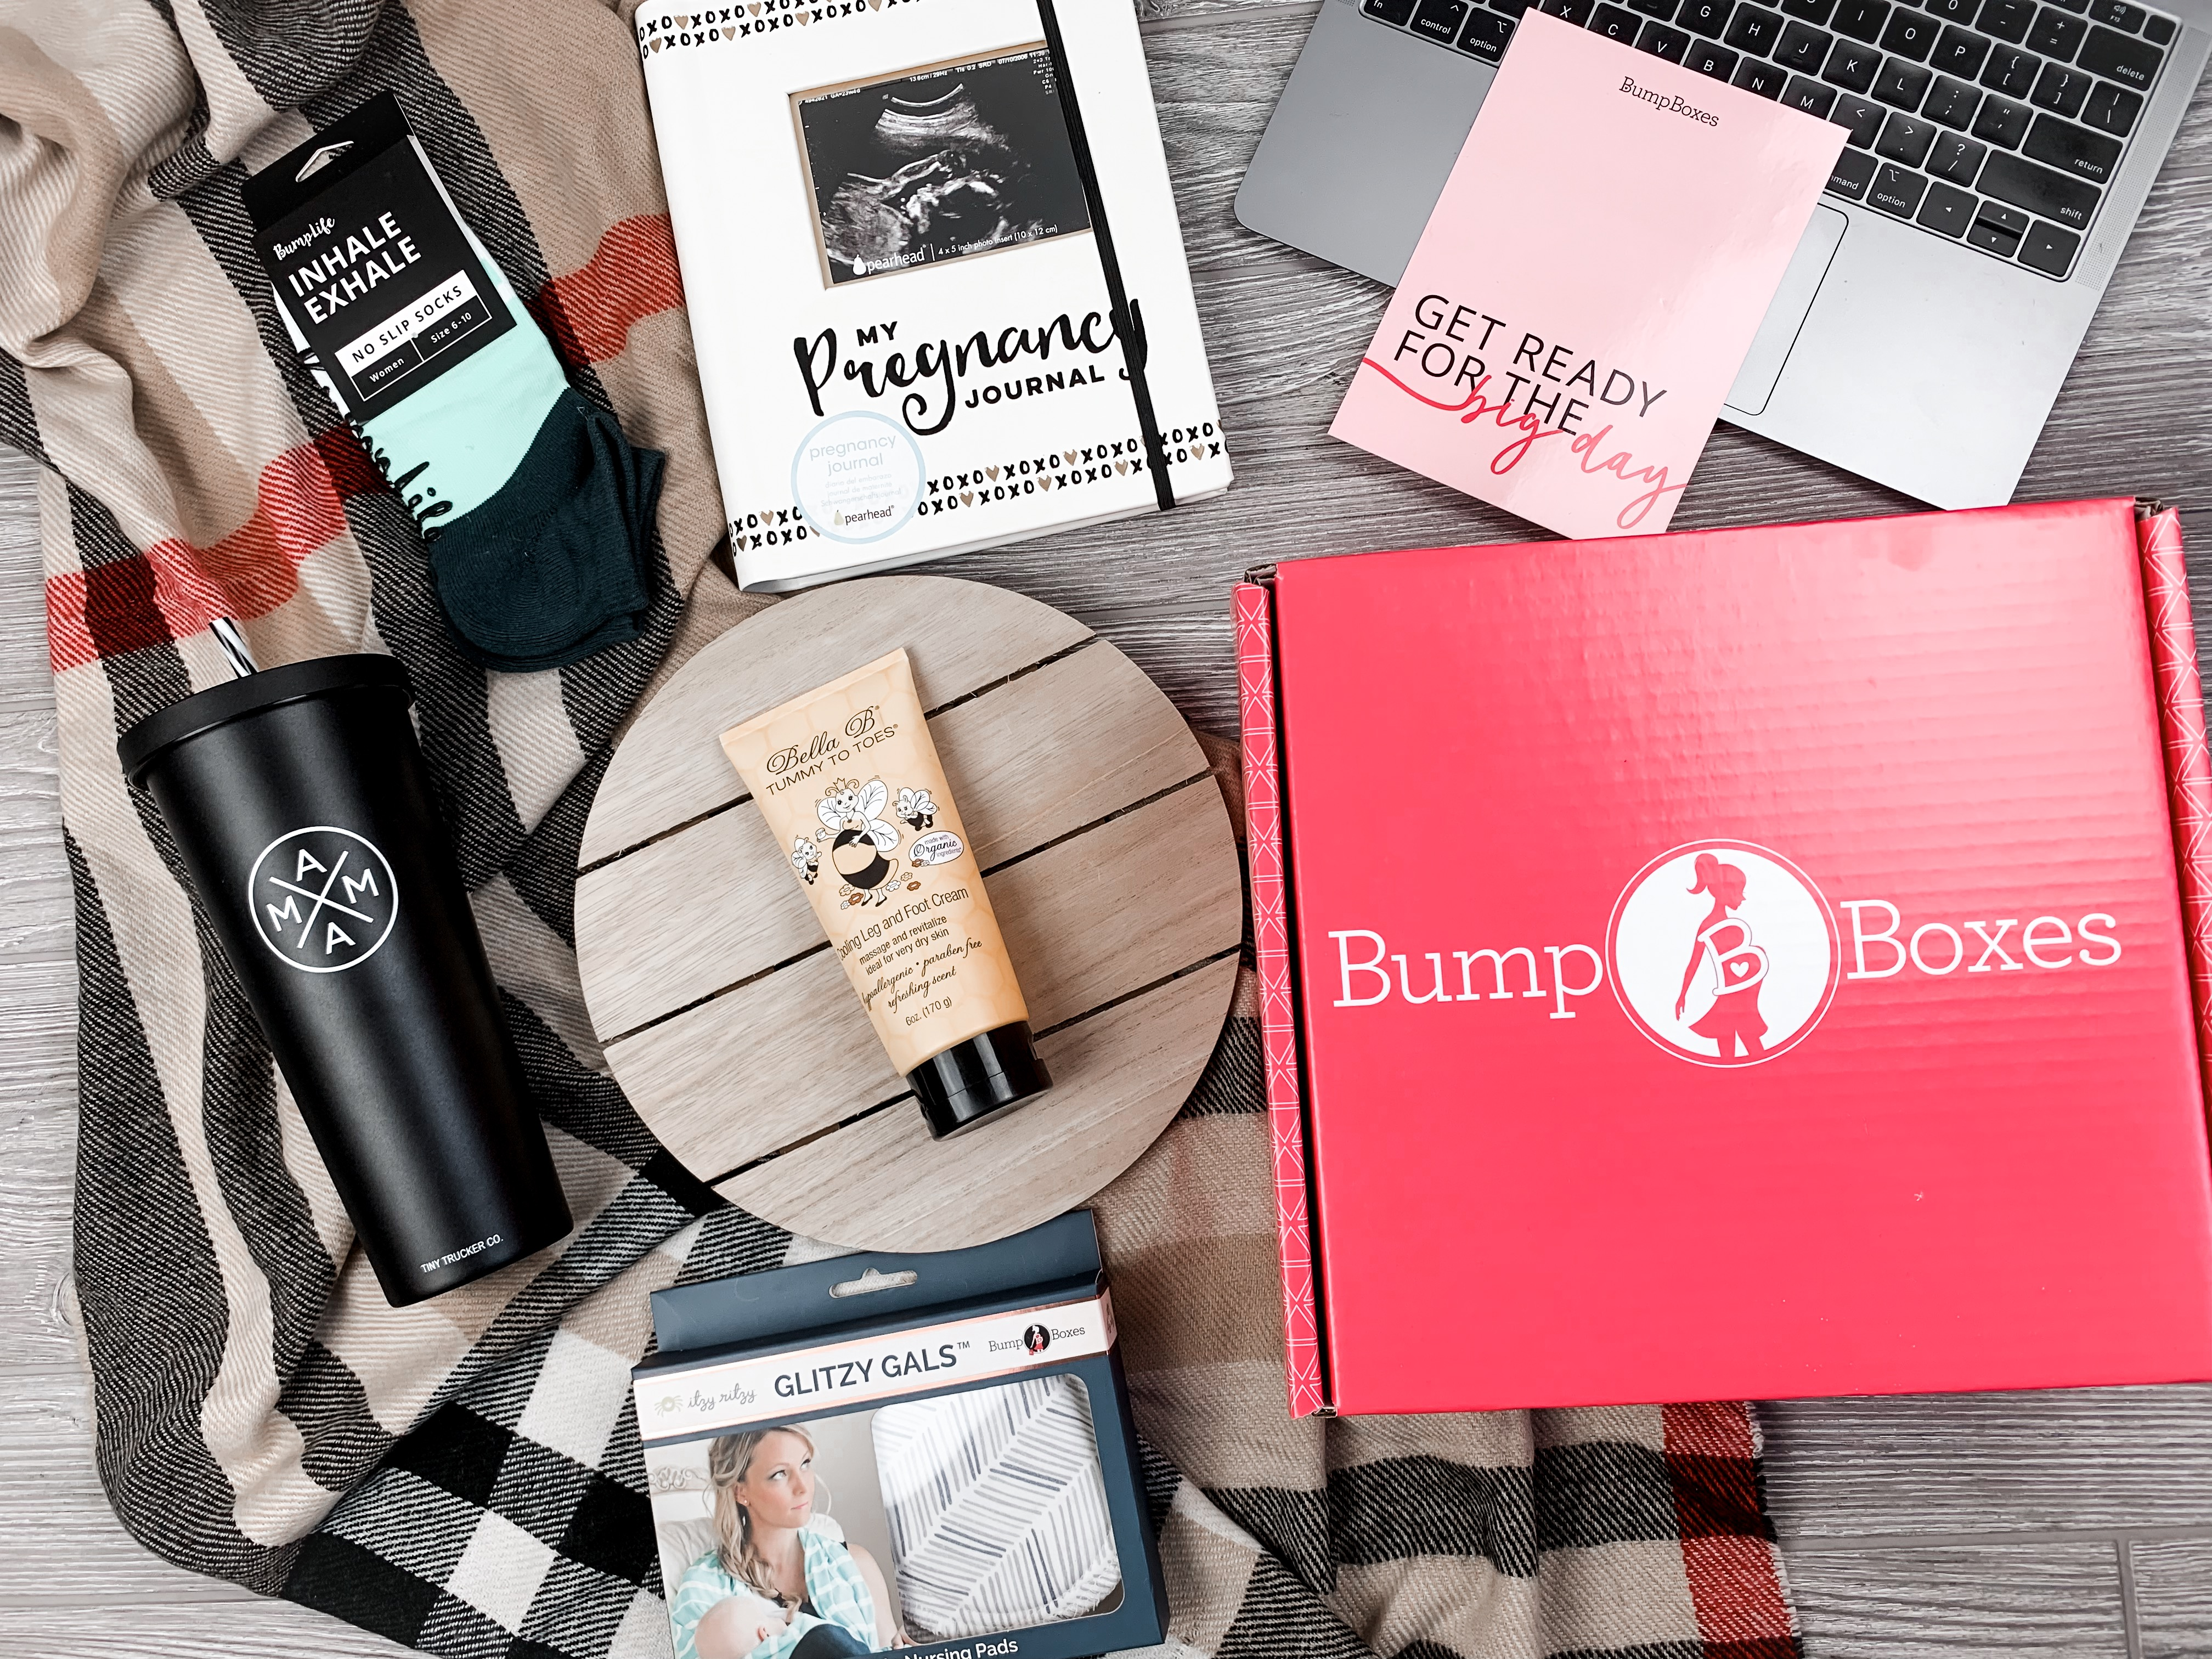 Bump Boxes, Inc.